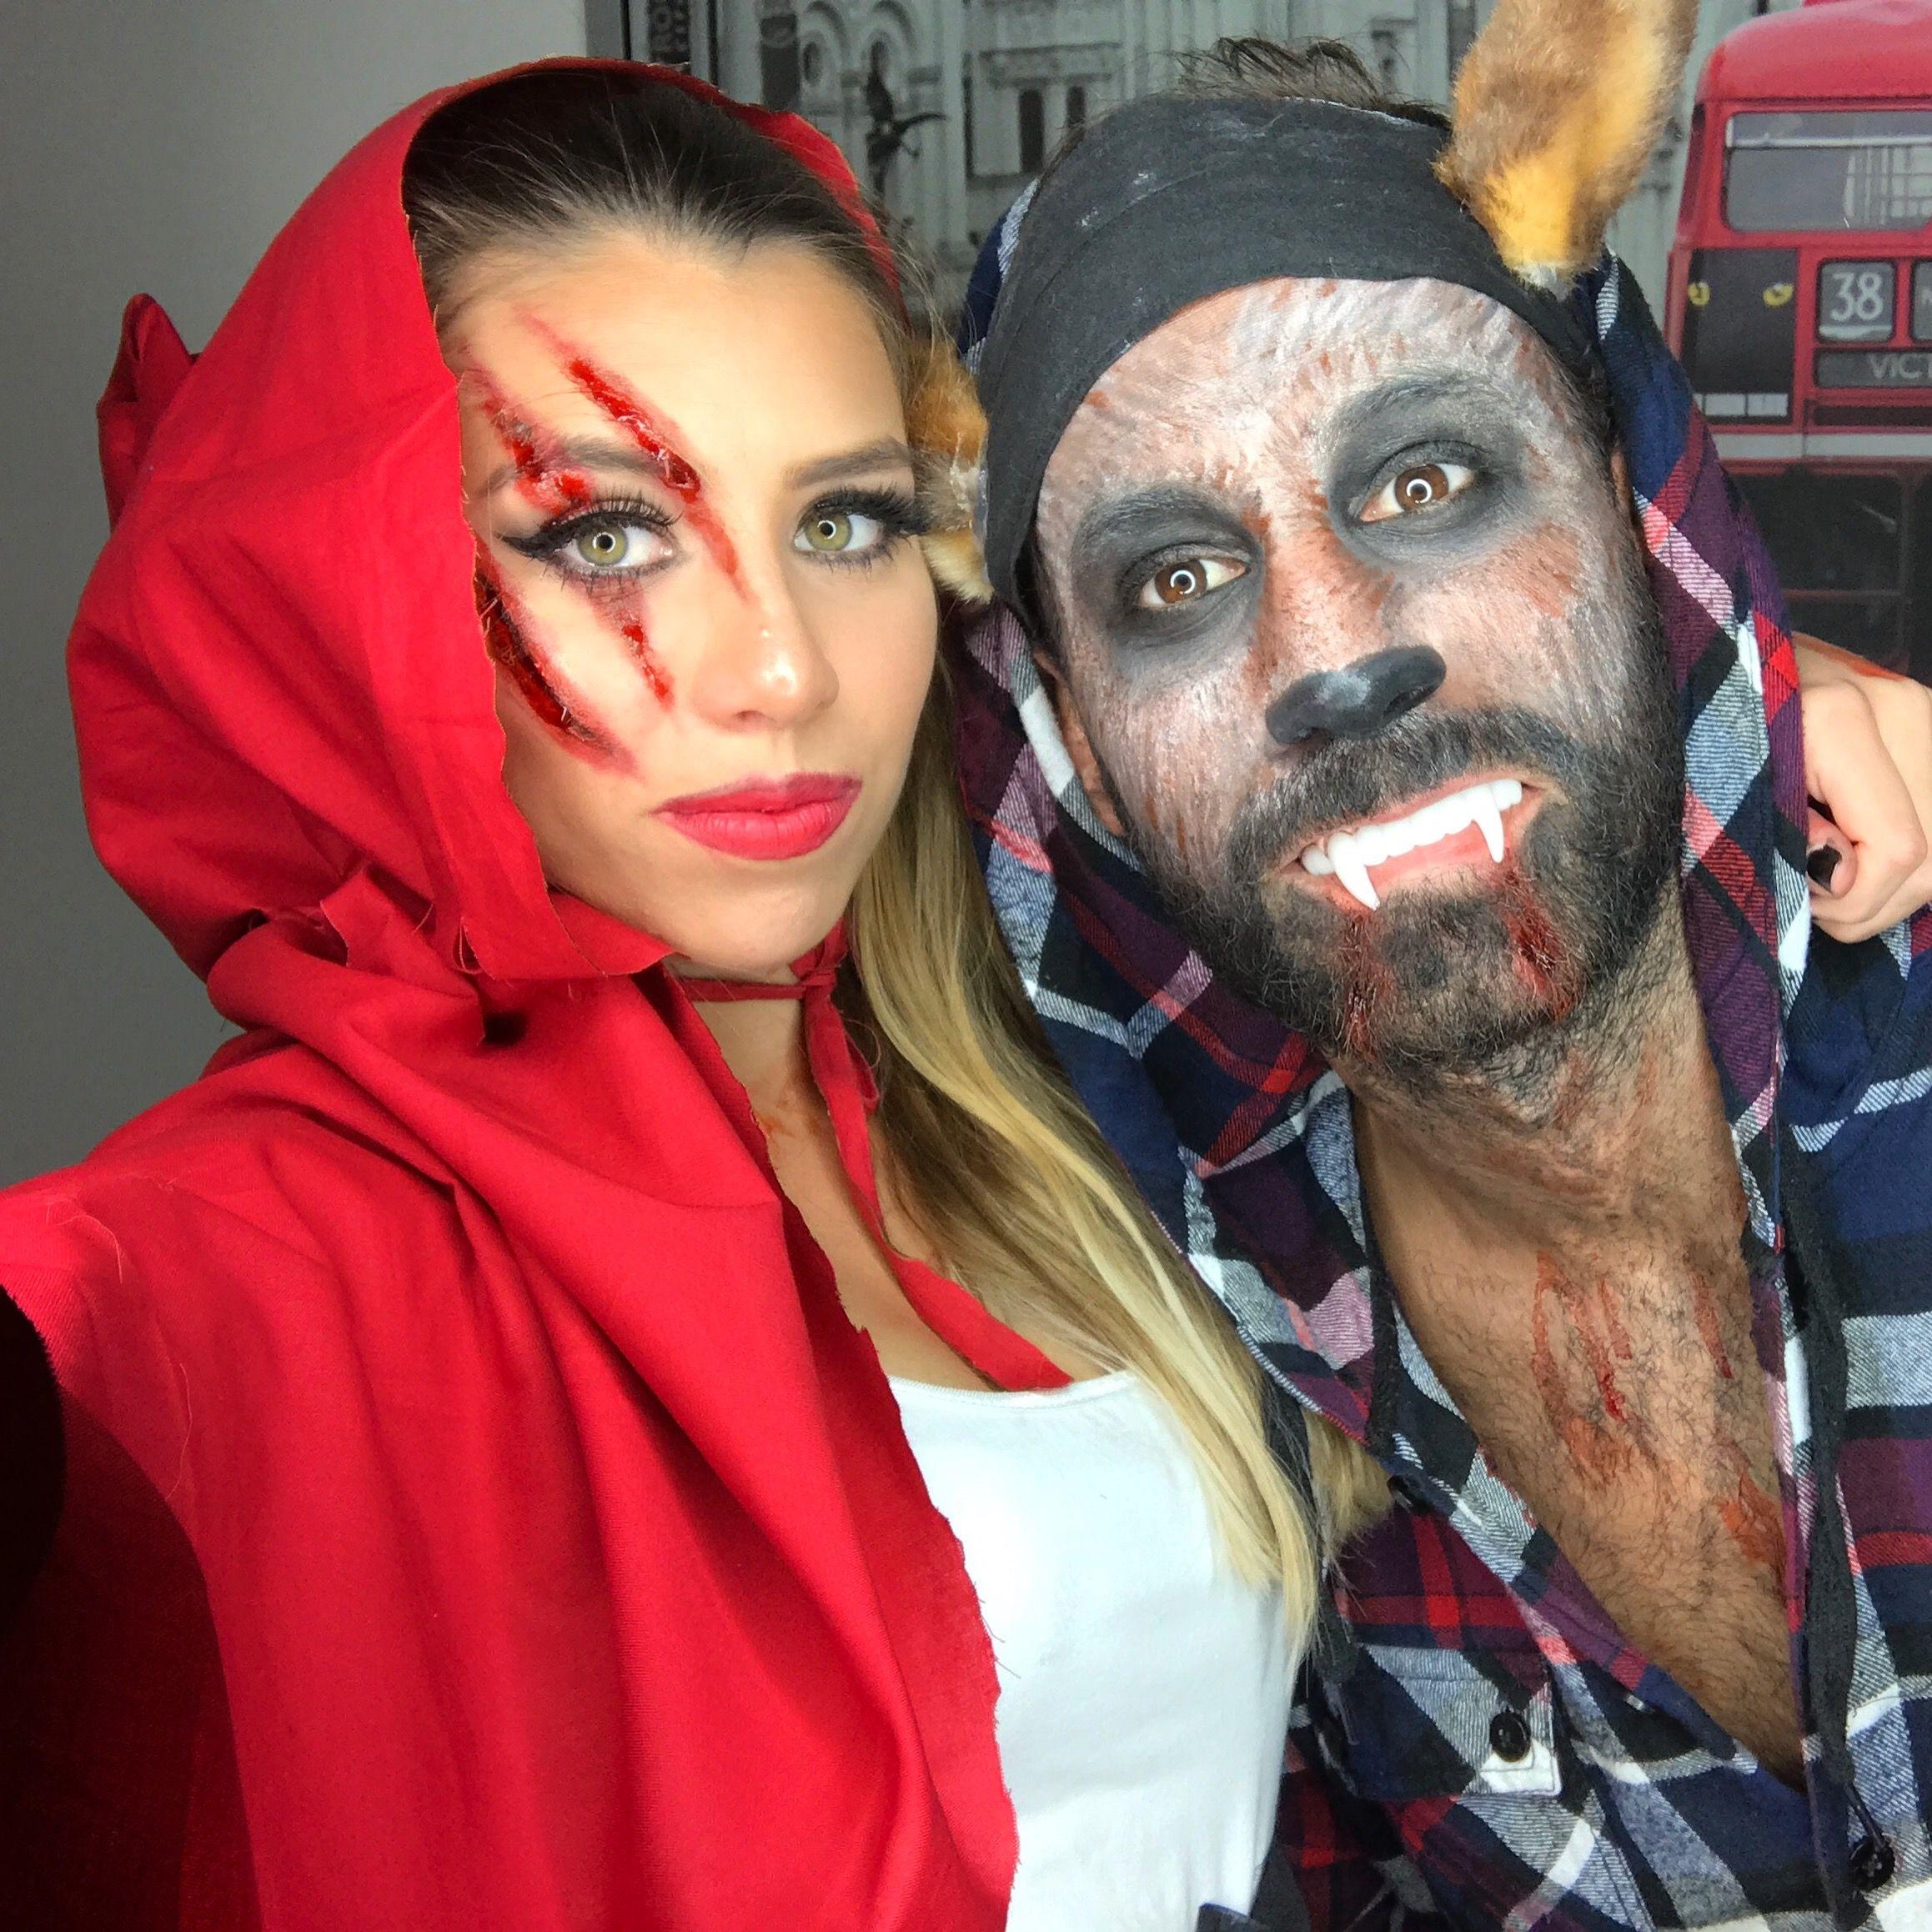 halloween costumes - Mens Couple Halloween Costumes